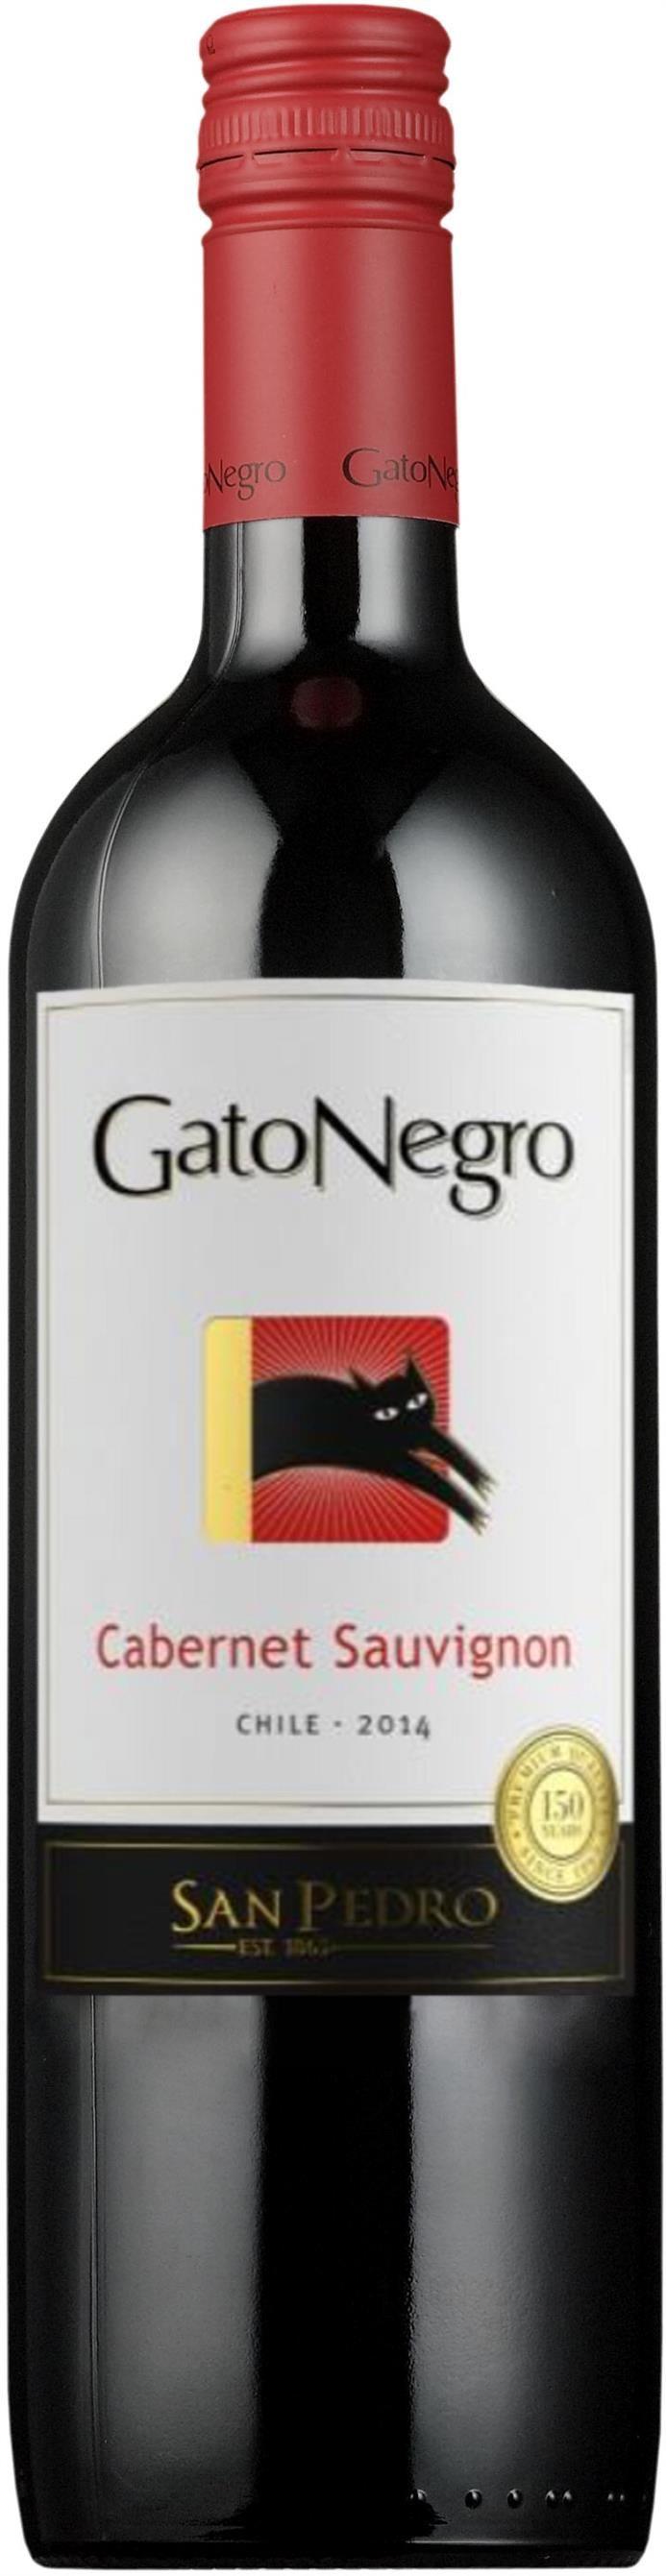 Gato Negro Cabernet Sauvignon -punaviini. 7,28€